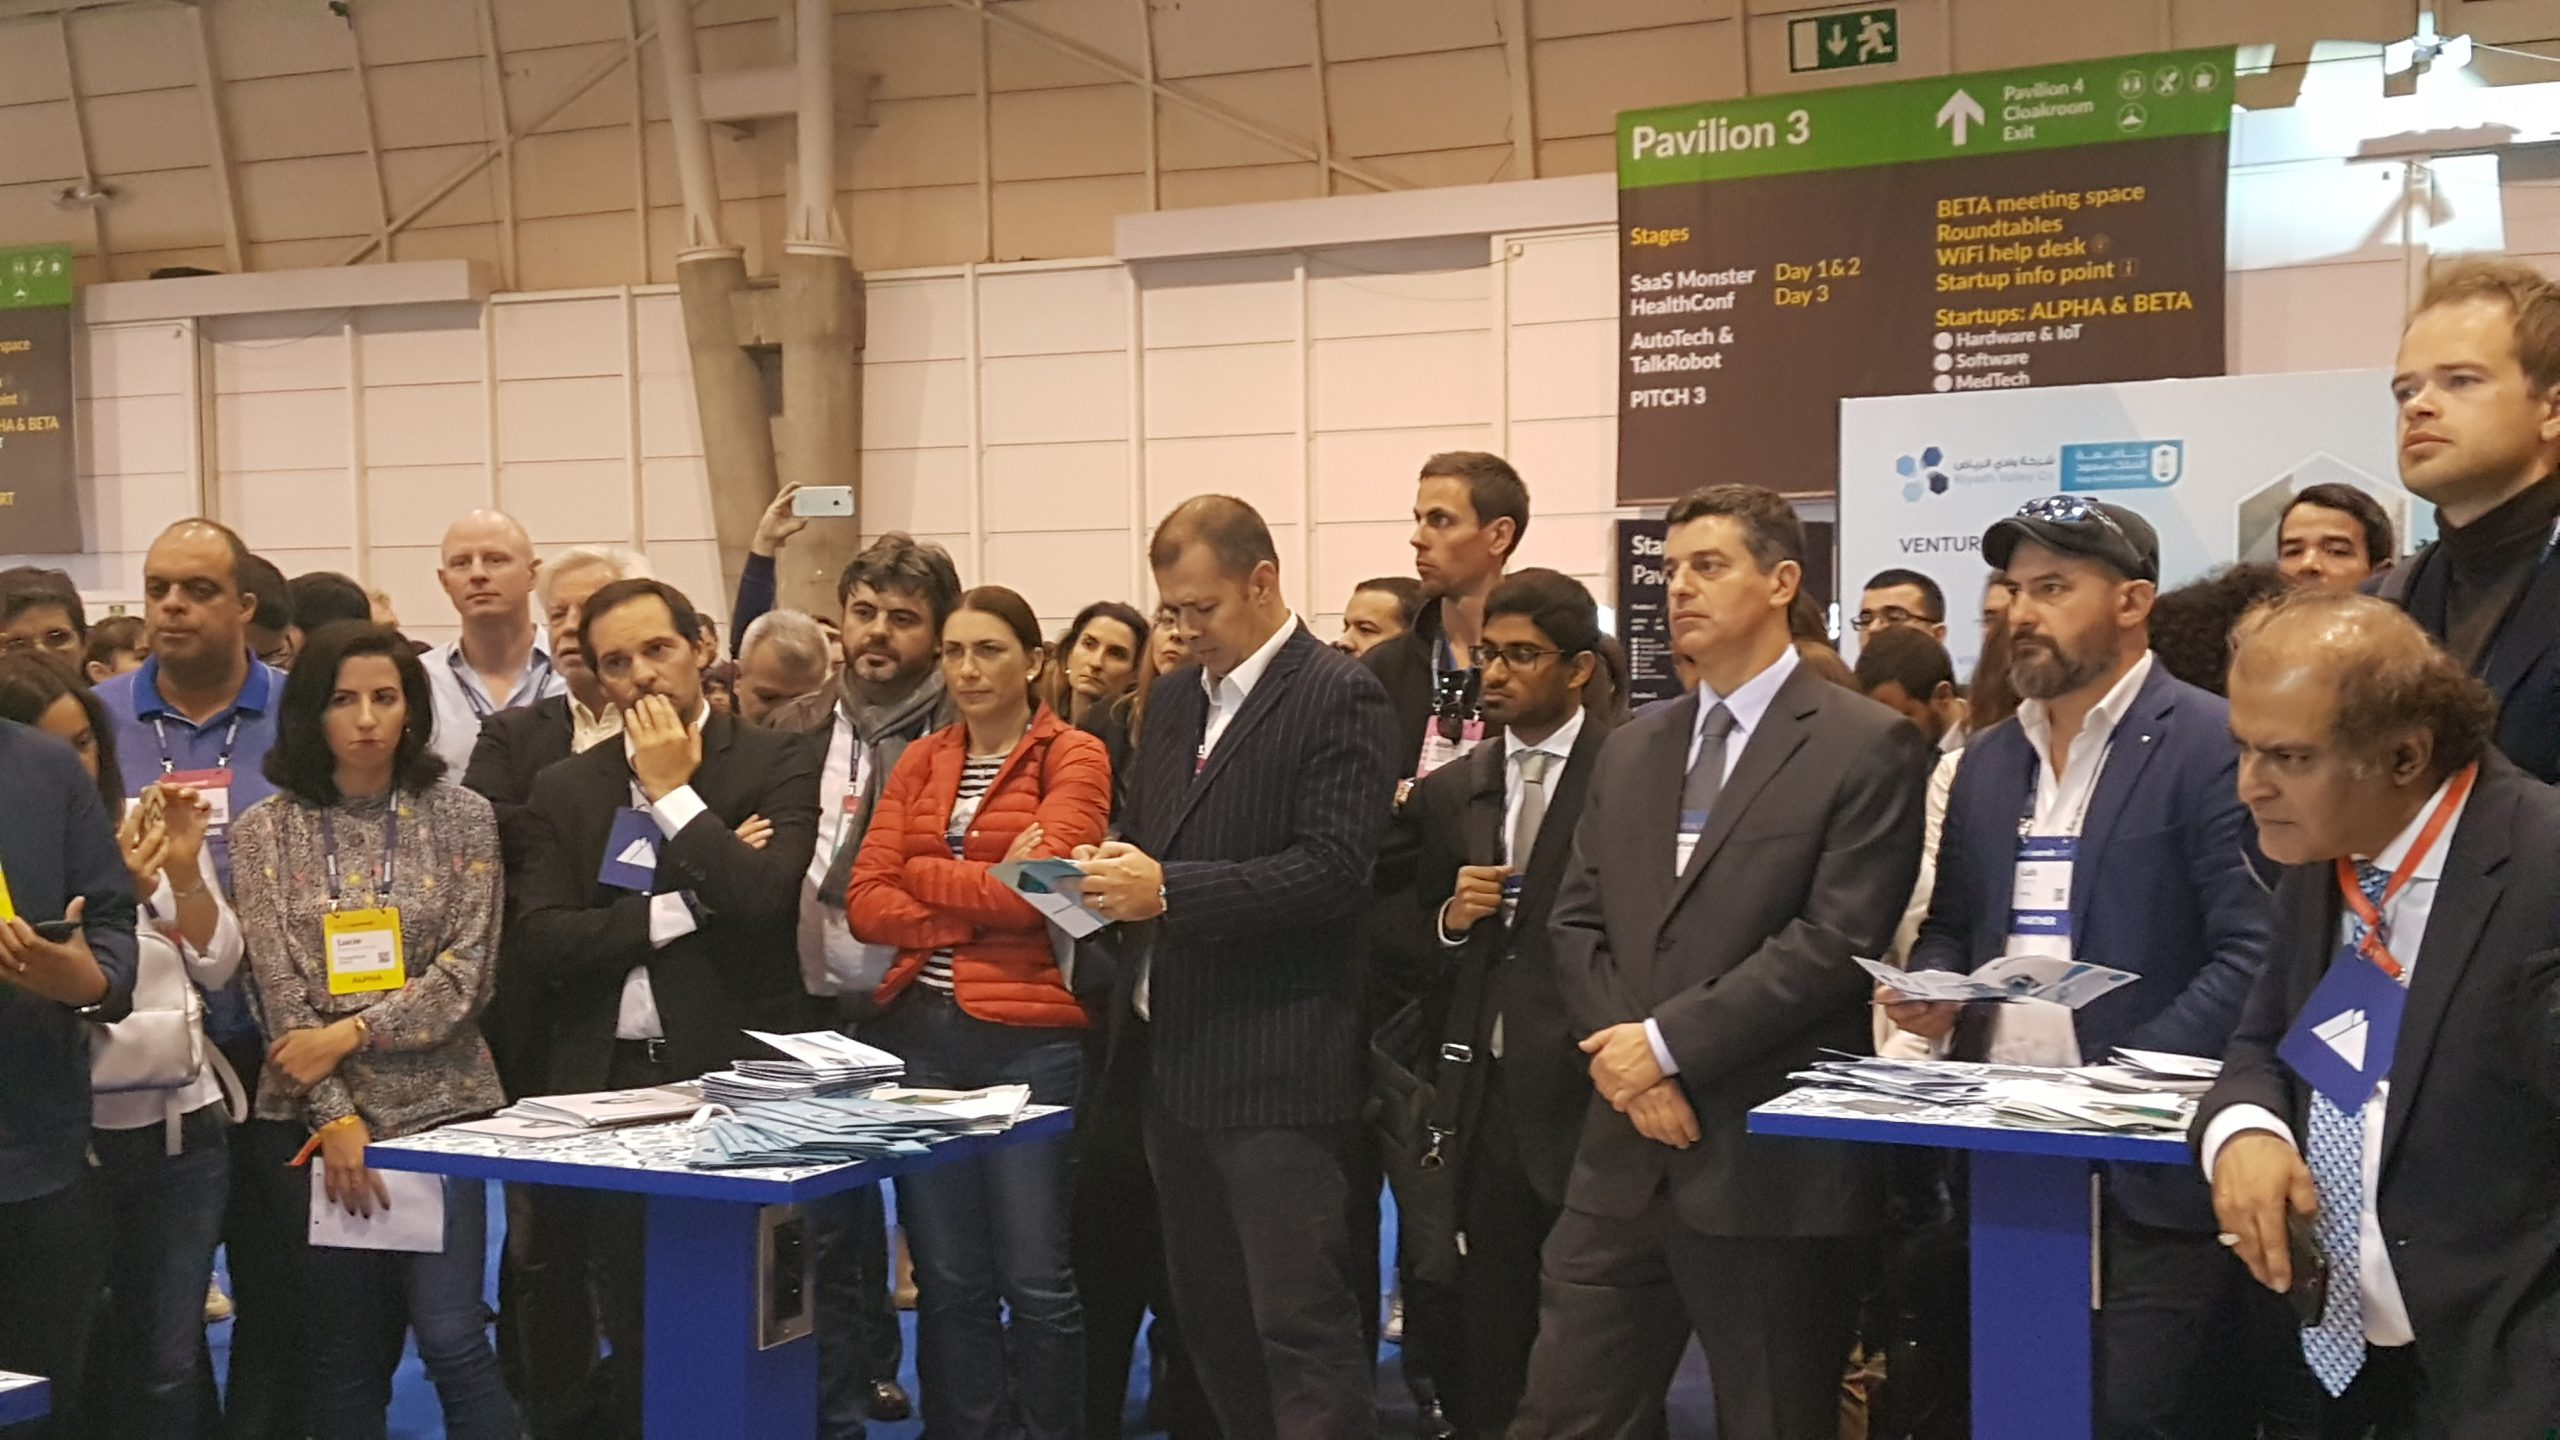 Delox apresentou o seu projeto ao Ministro da Economia, Manuel Caldeira Cabral